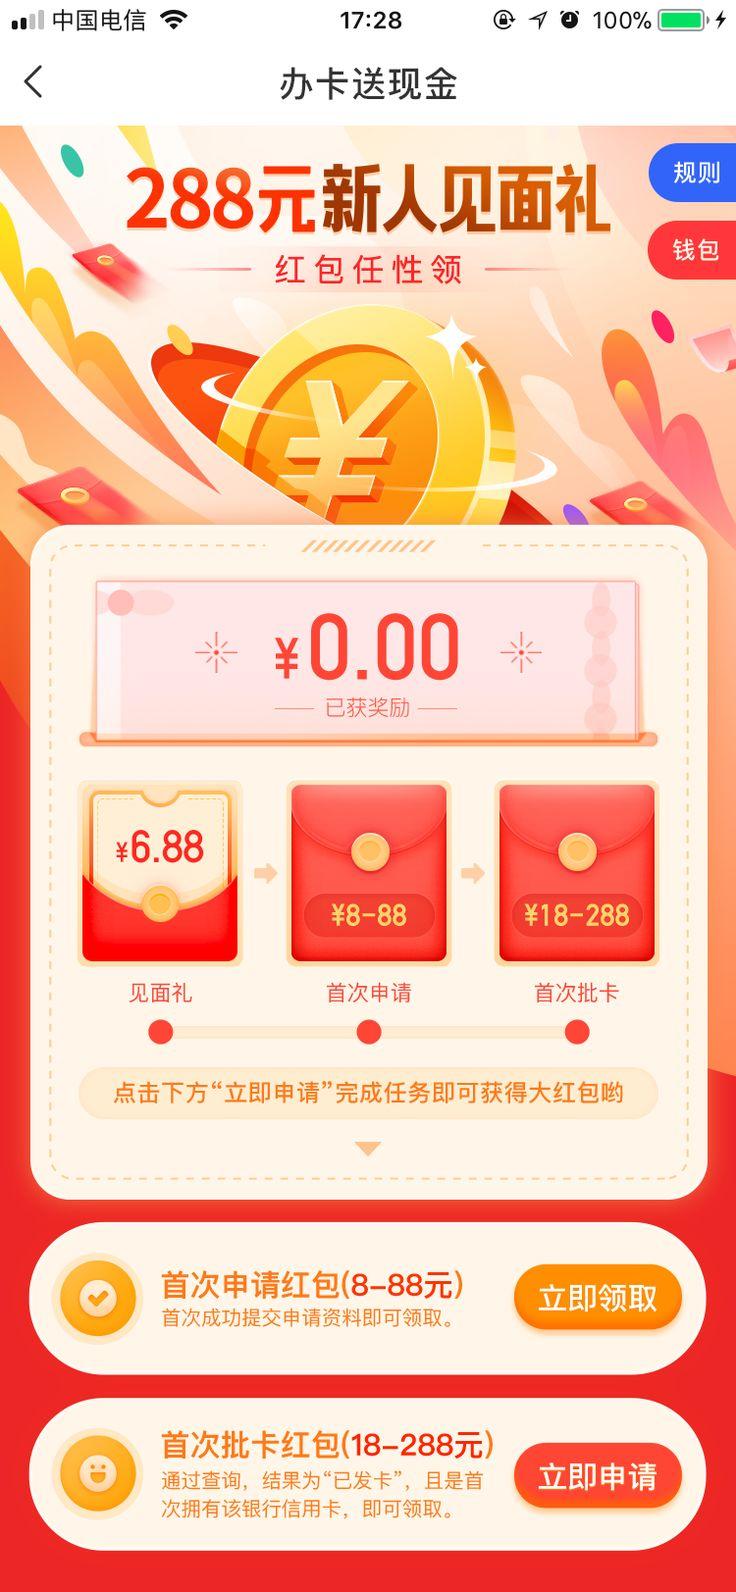 红包,金融,新人,金币,邀请 App design, Mobile design, Web design